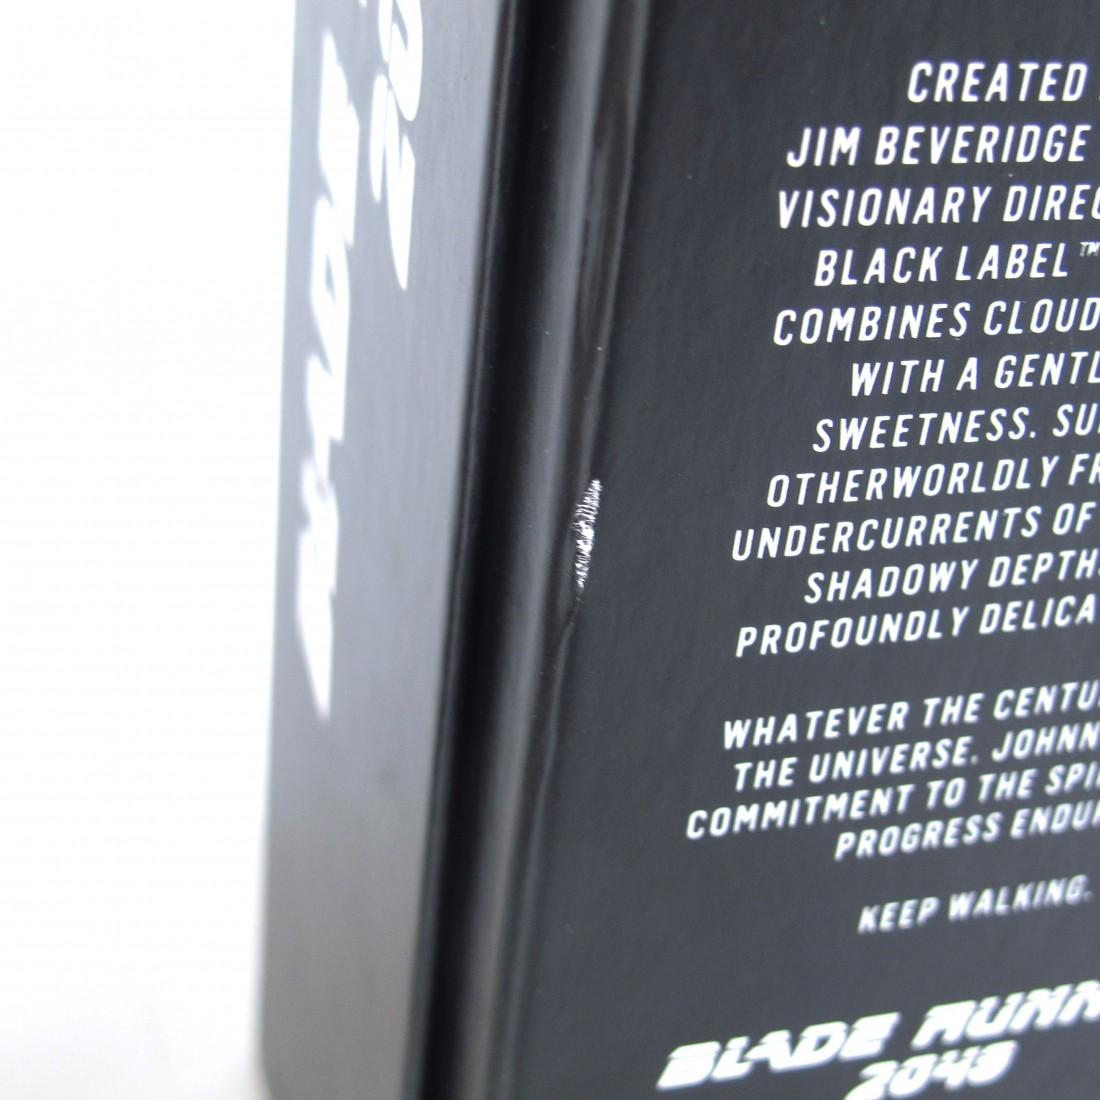 Johnnie Walker Black Label The Director's Cut / Blade Runner 2049